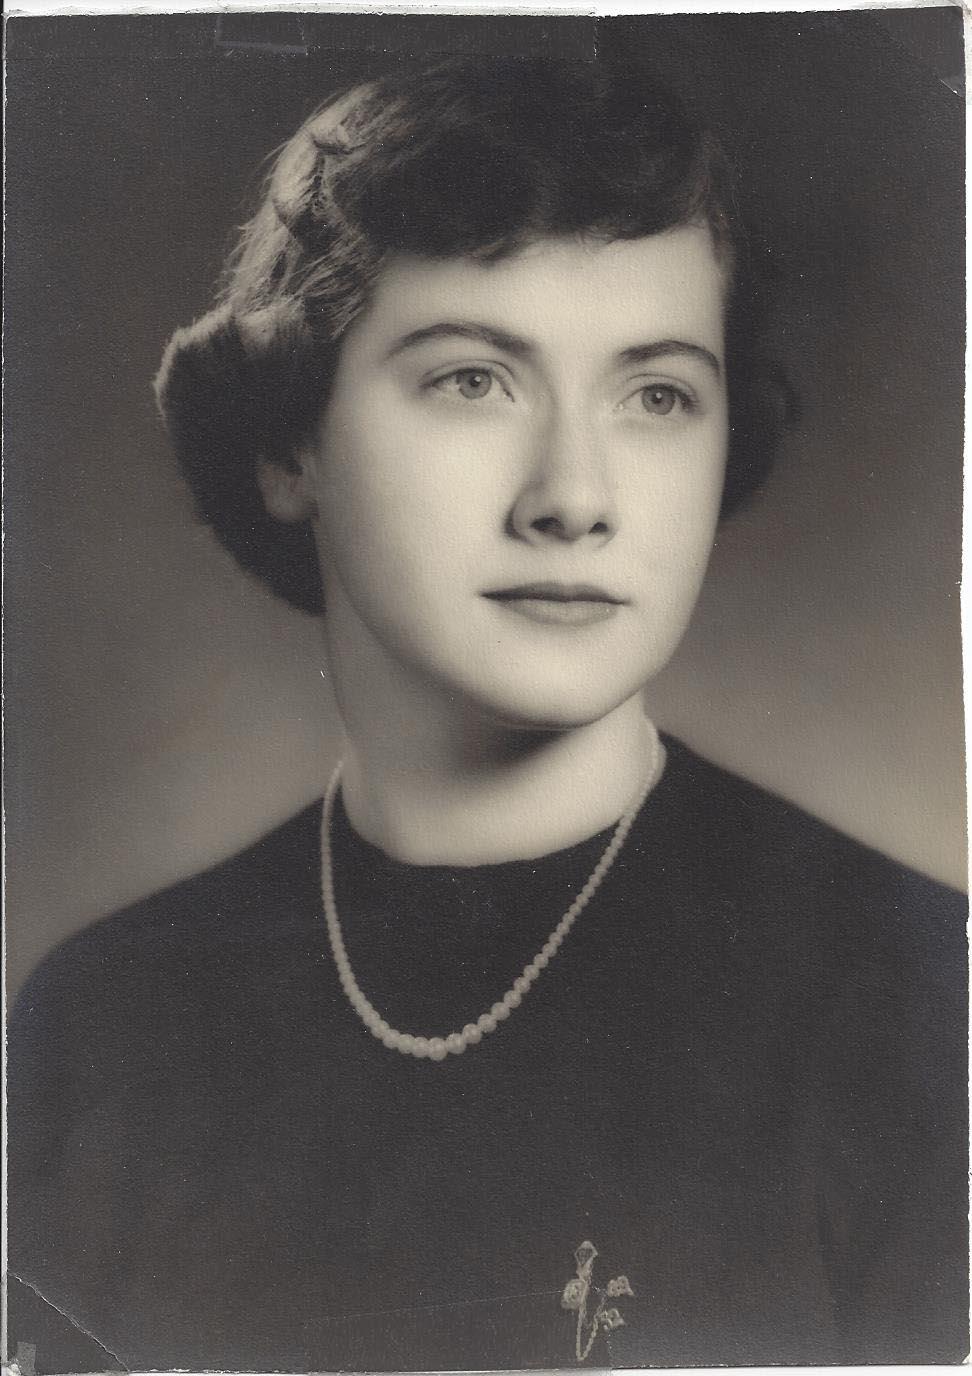 Grandma Dolores